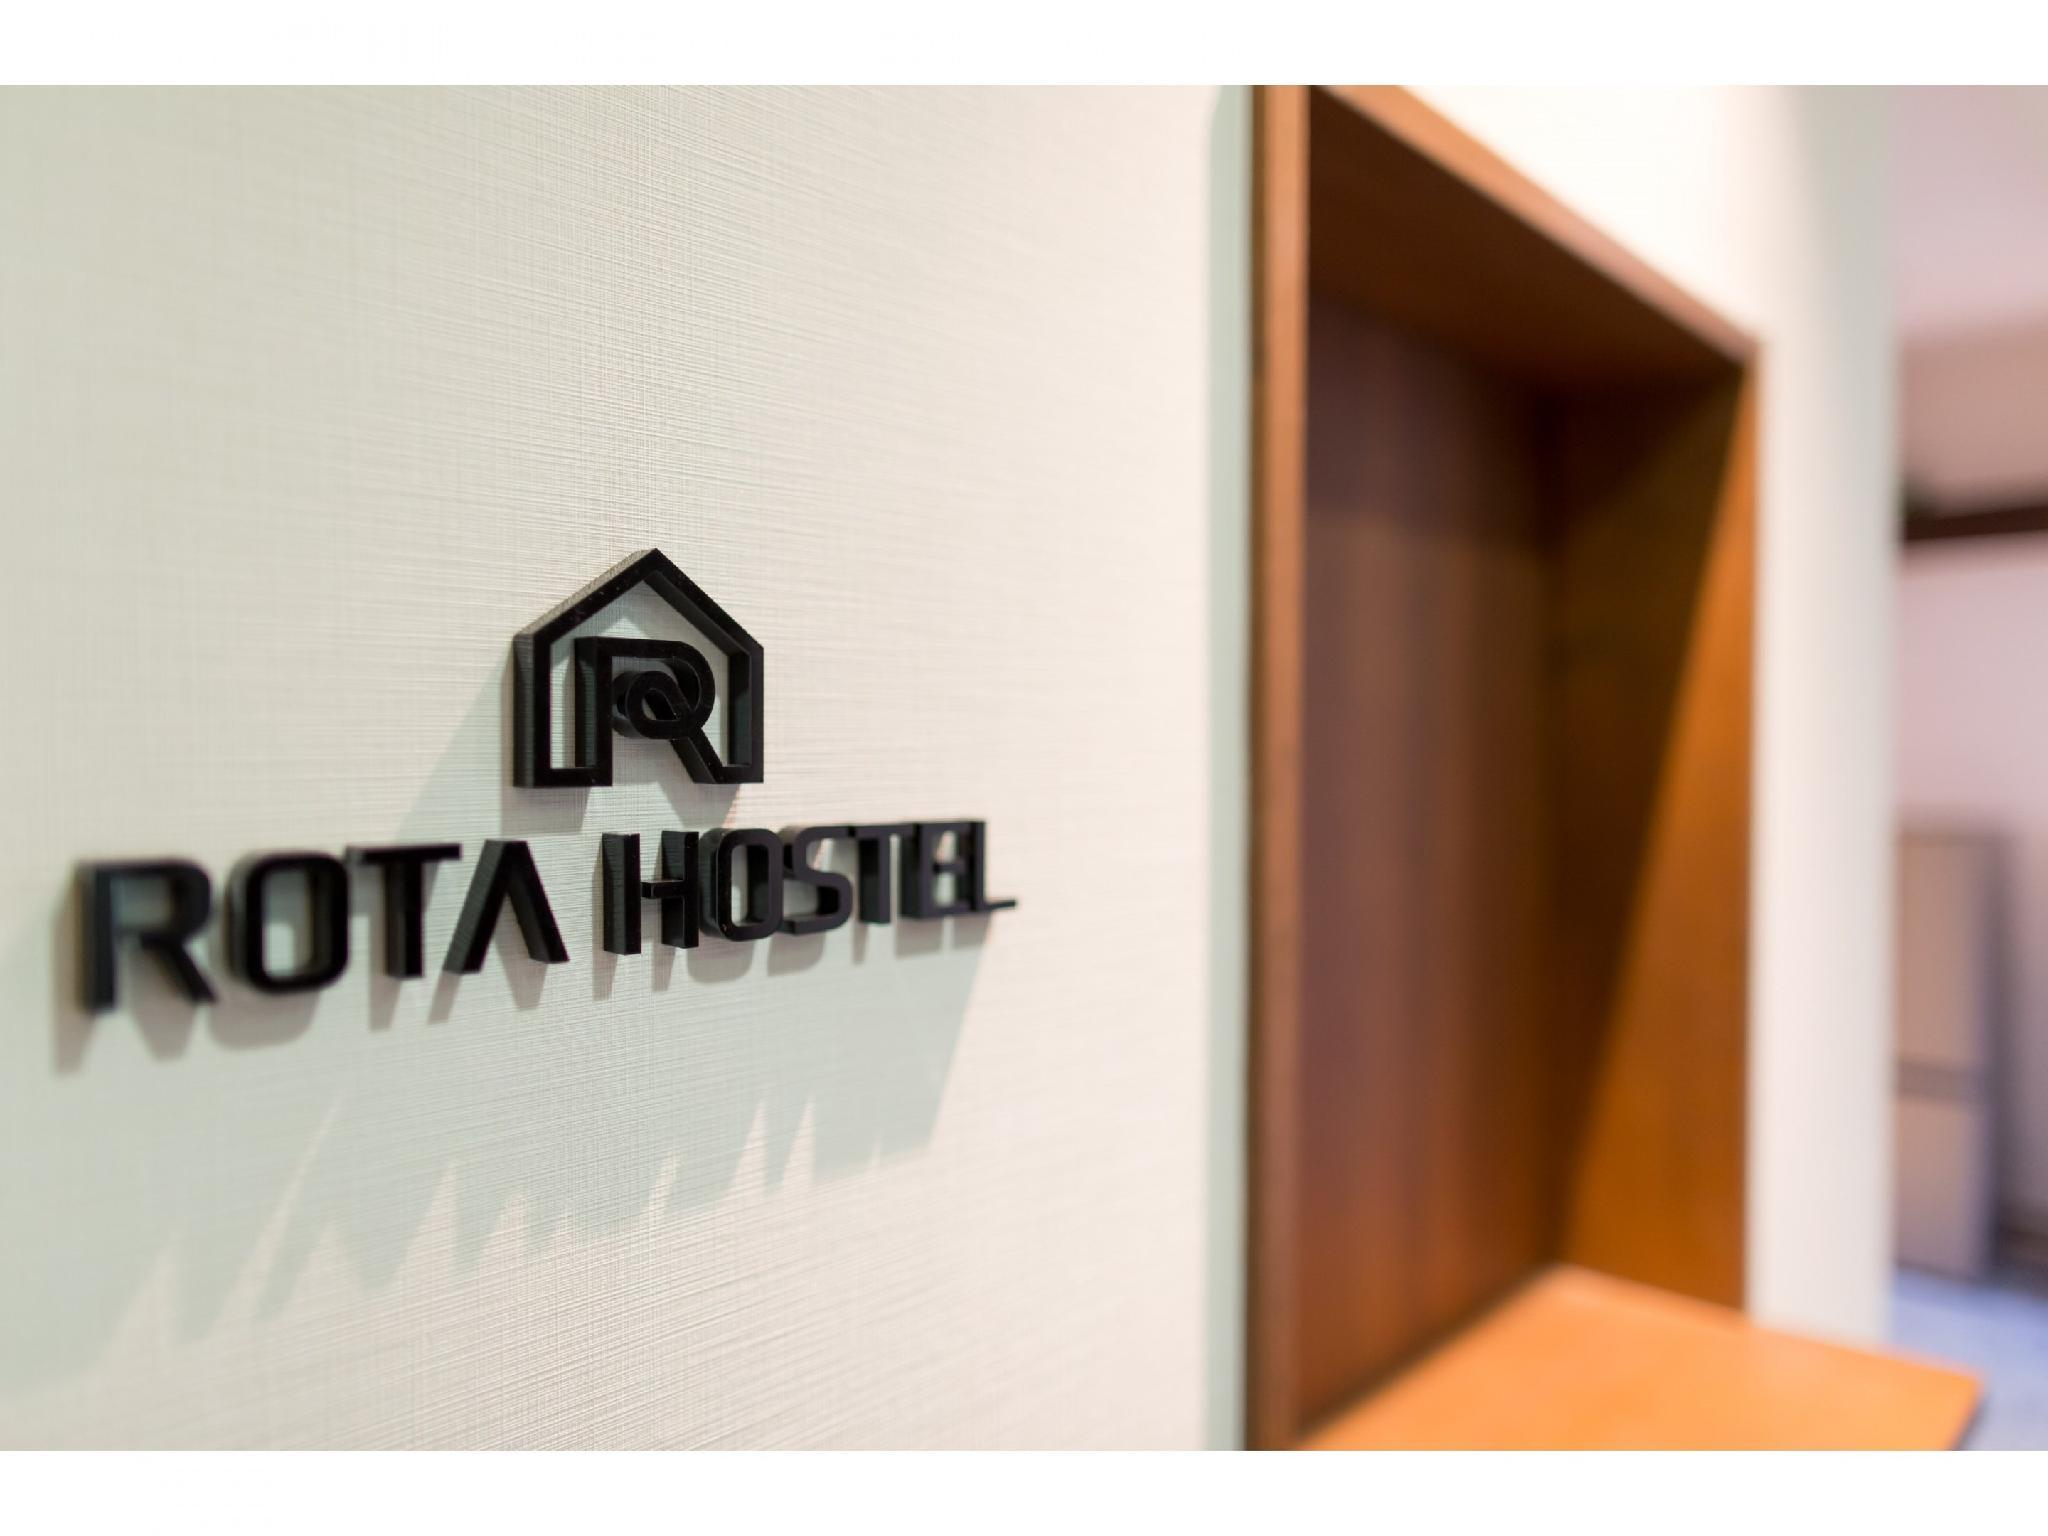 Rota Hostel